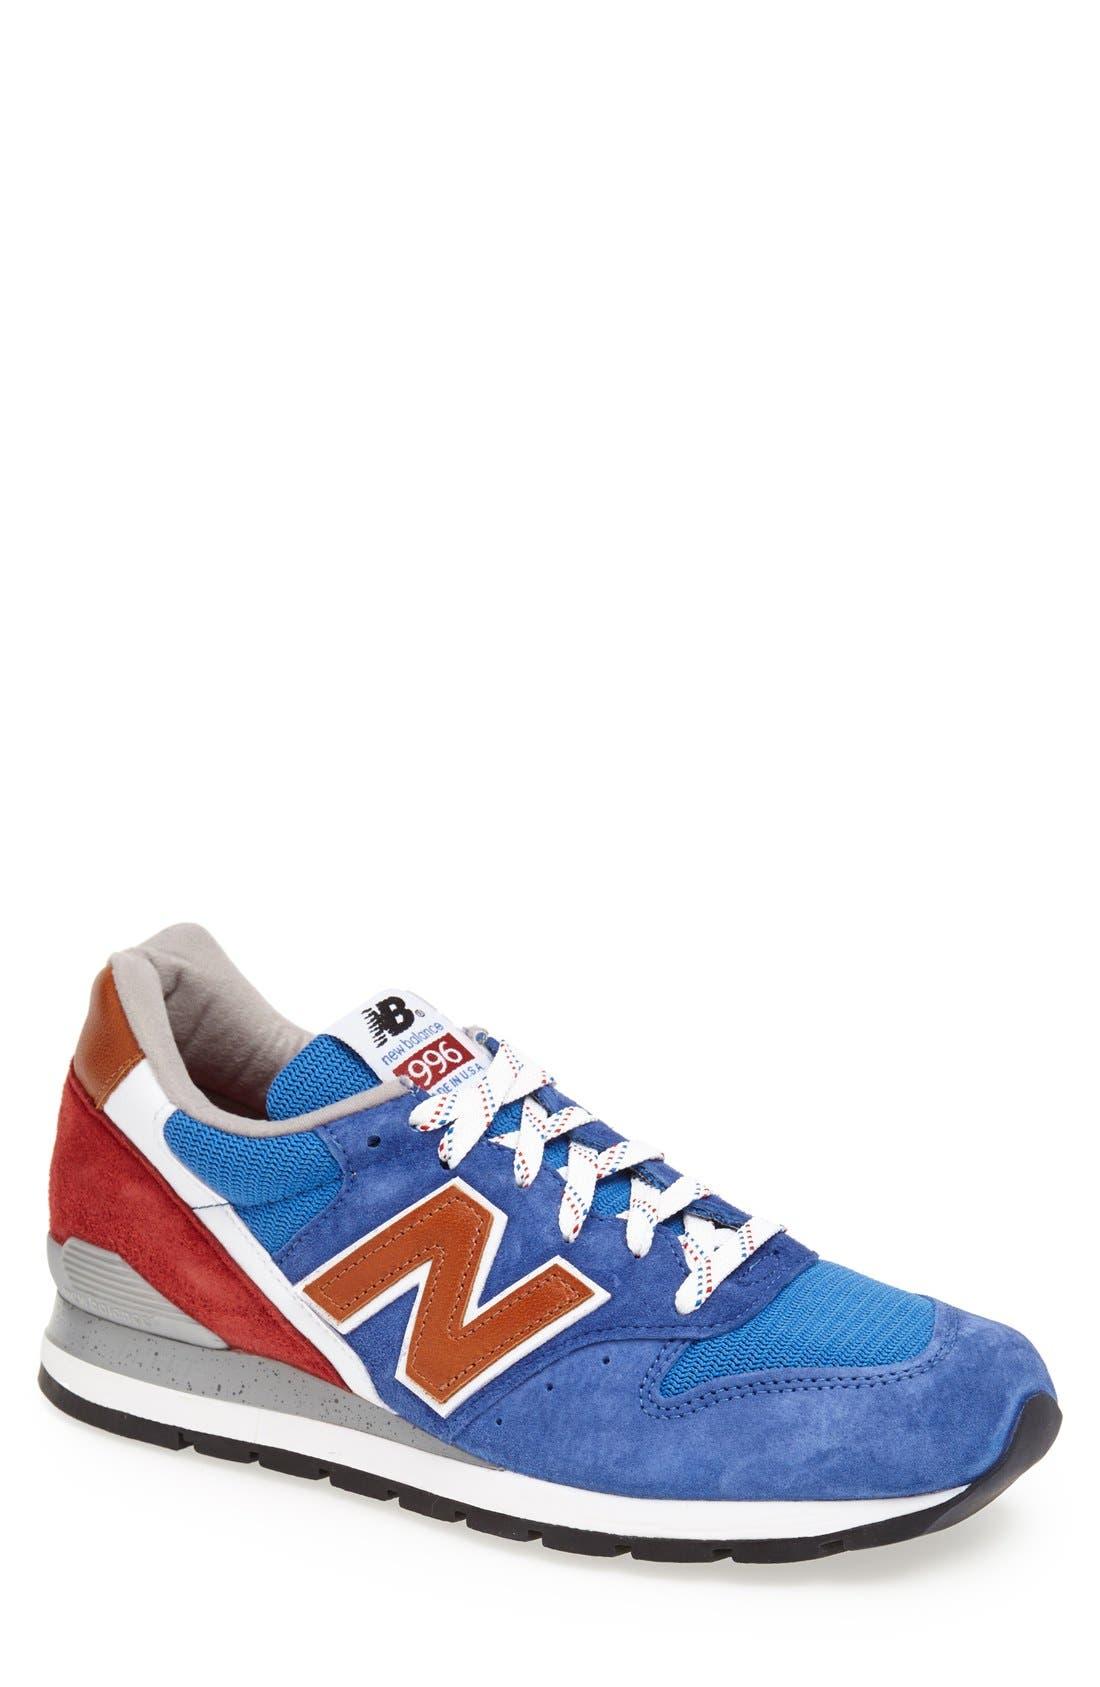 Main Image - New Balance '996' Sneaker (Men)